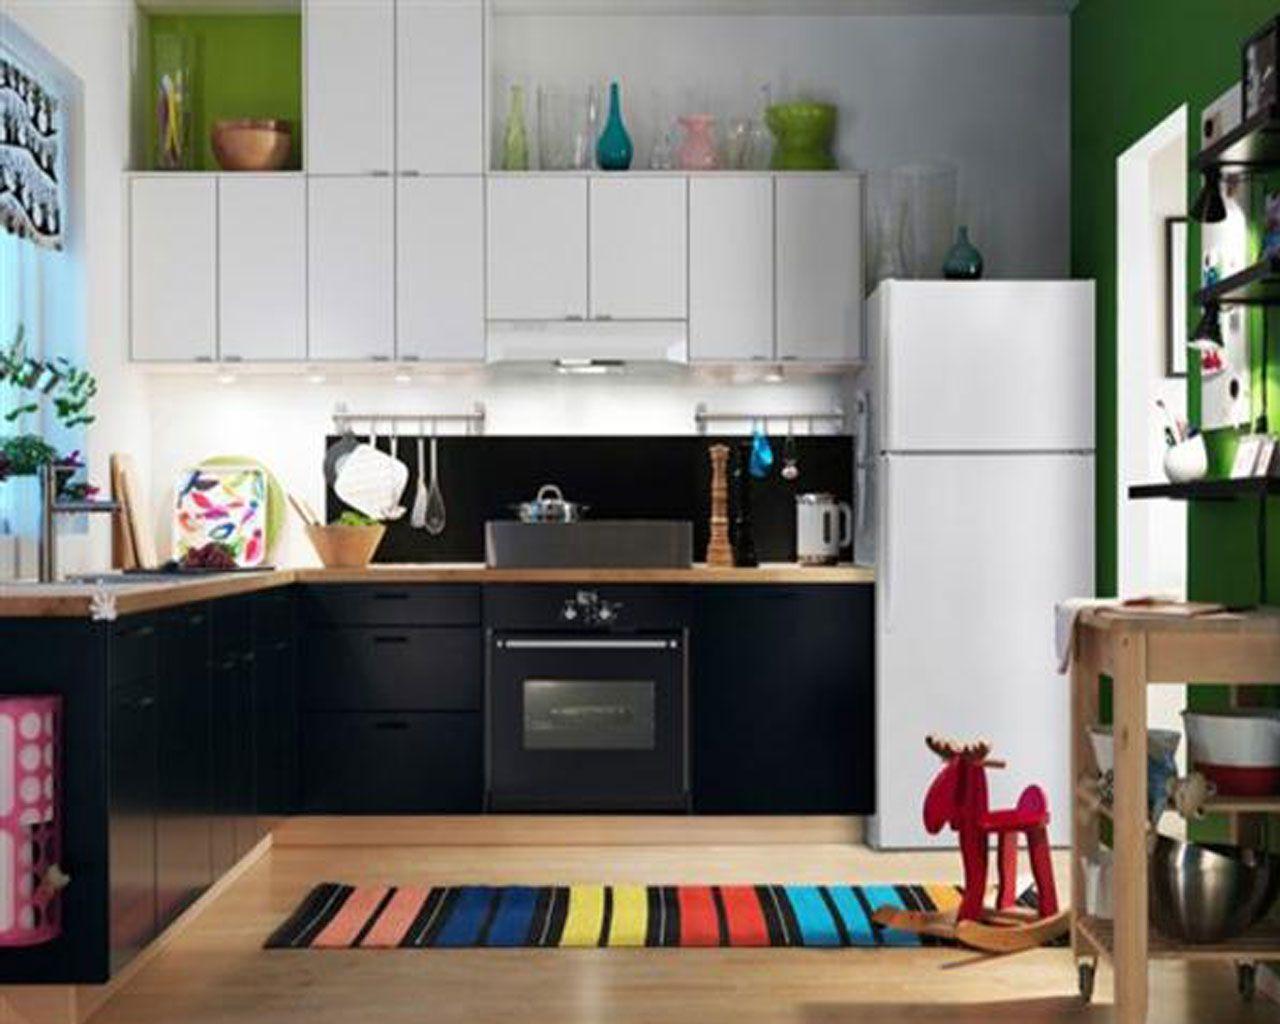 Stylish IKEA Kitchen Design Ideas 2012 : White and Green ...